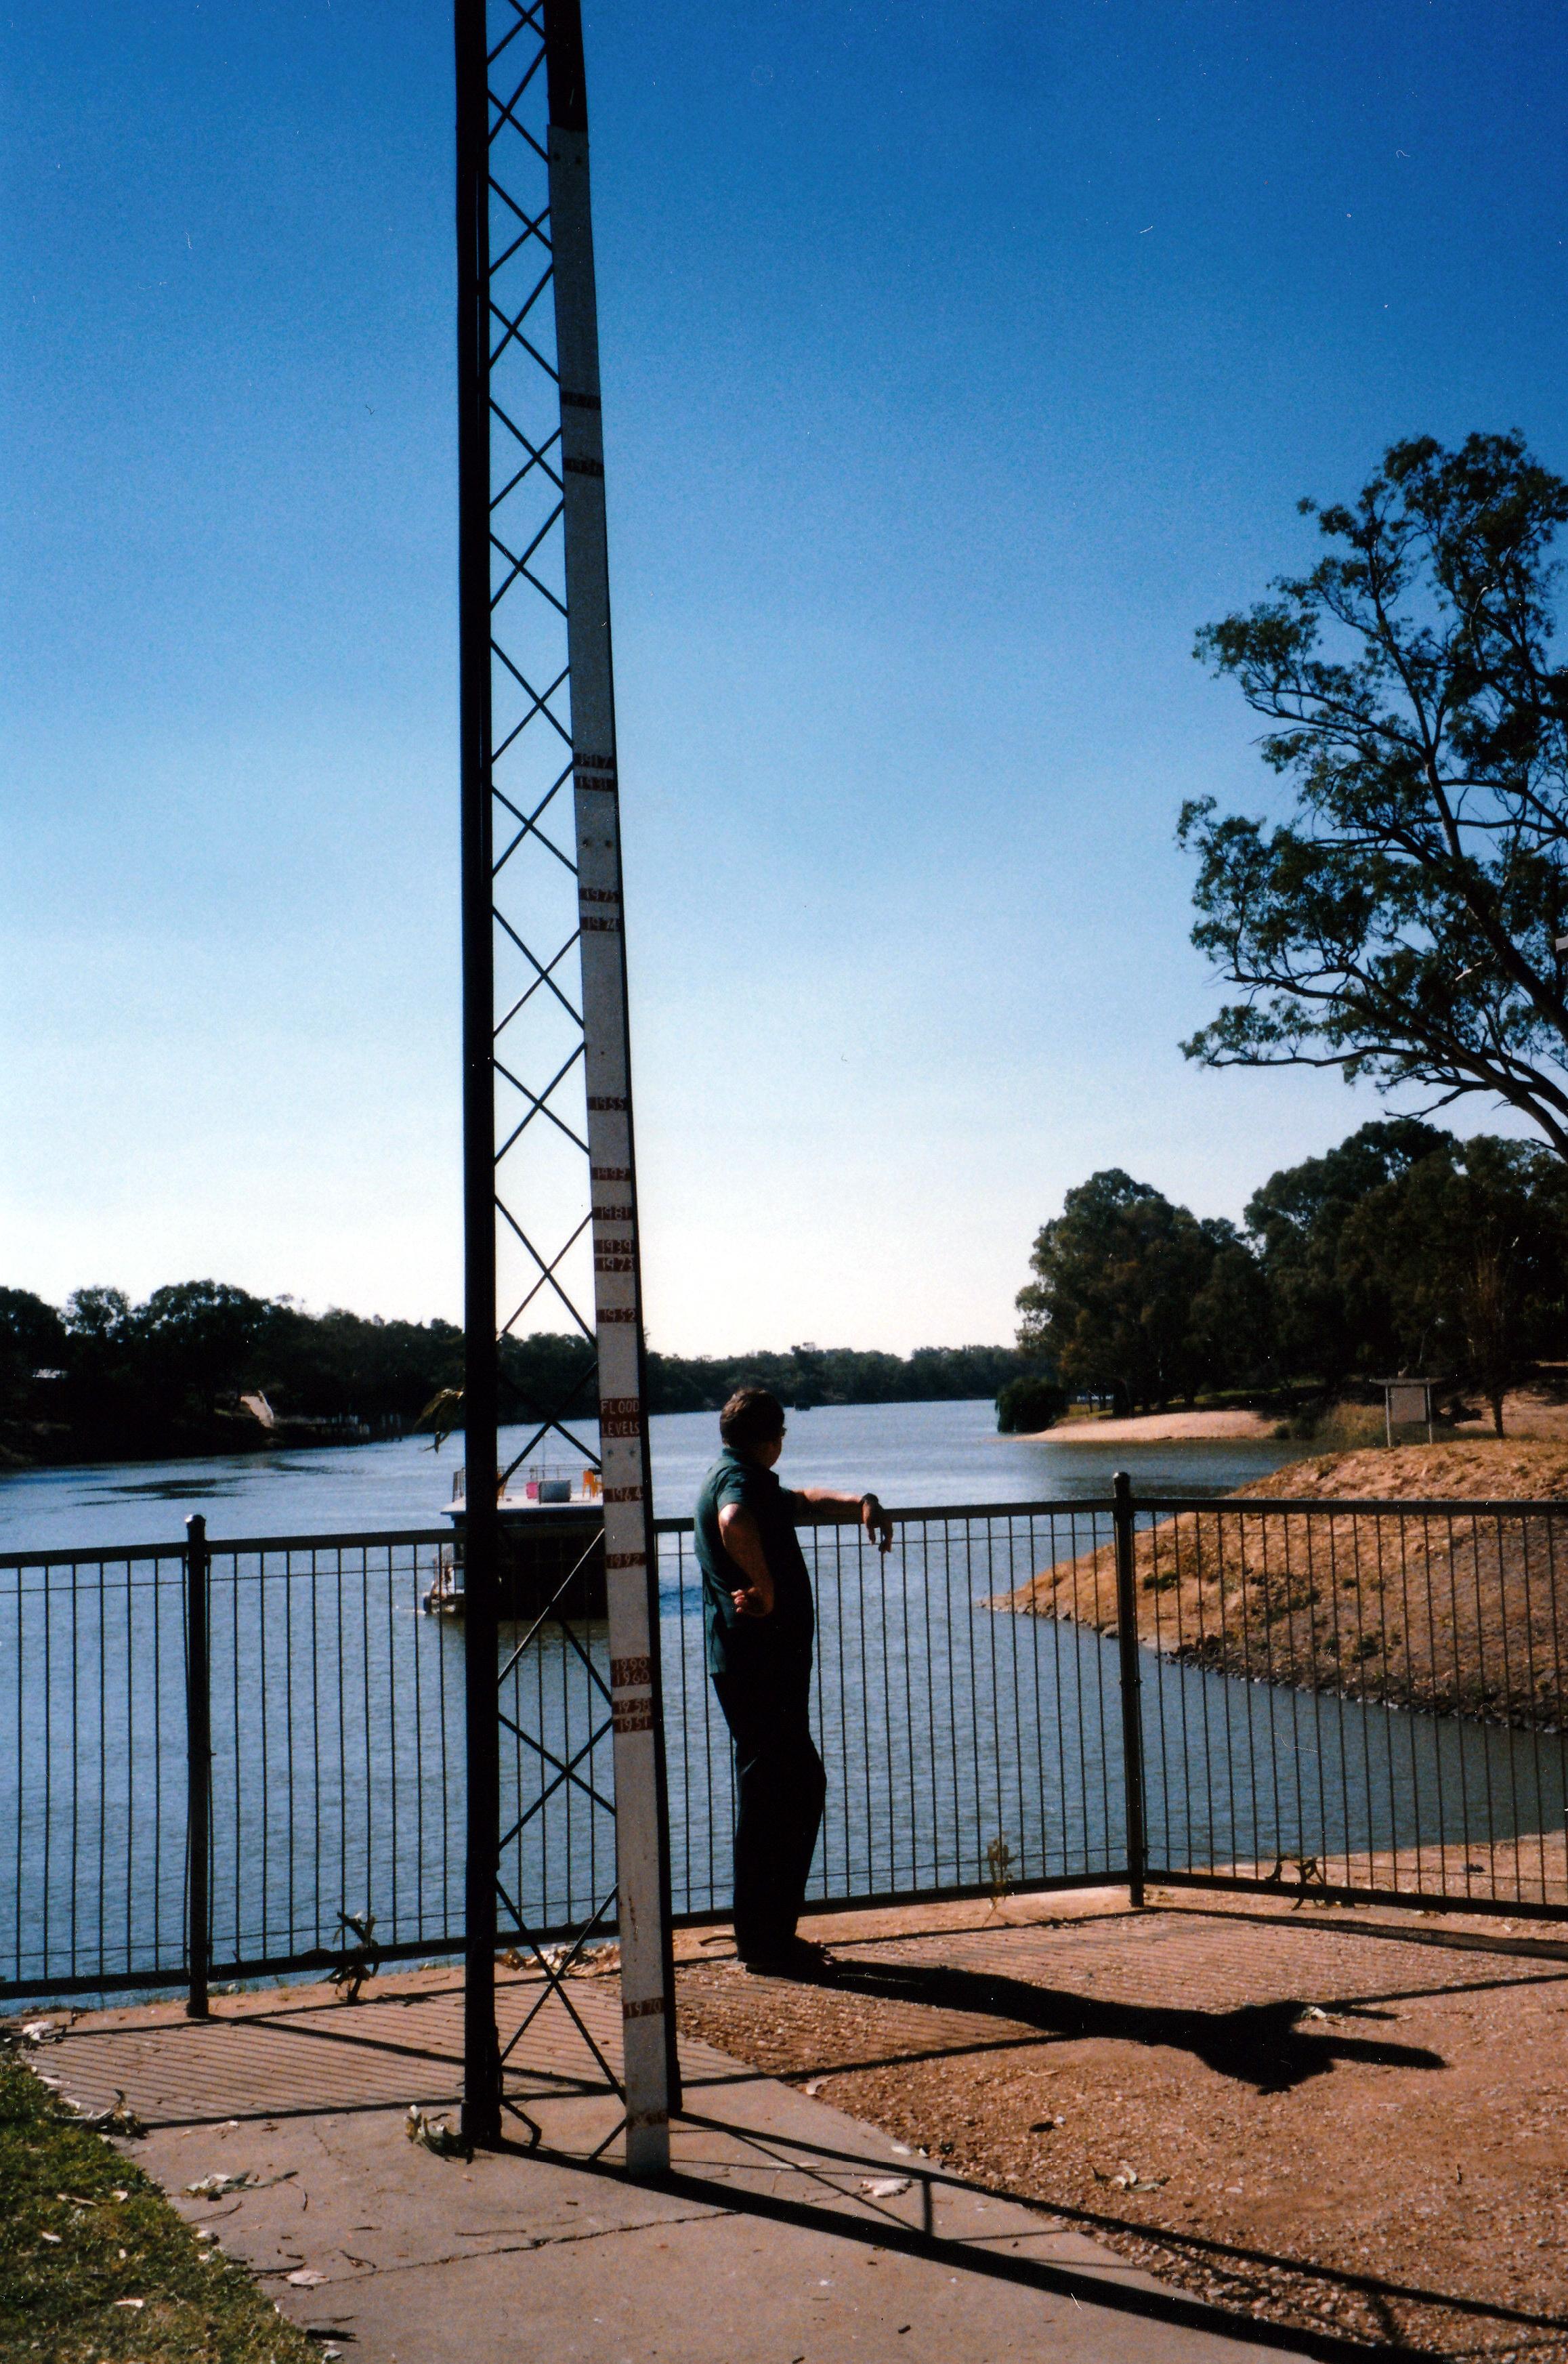 04-16-1999-lock-11-flood-marker